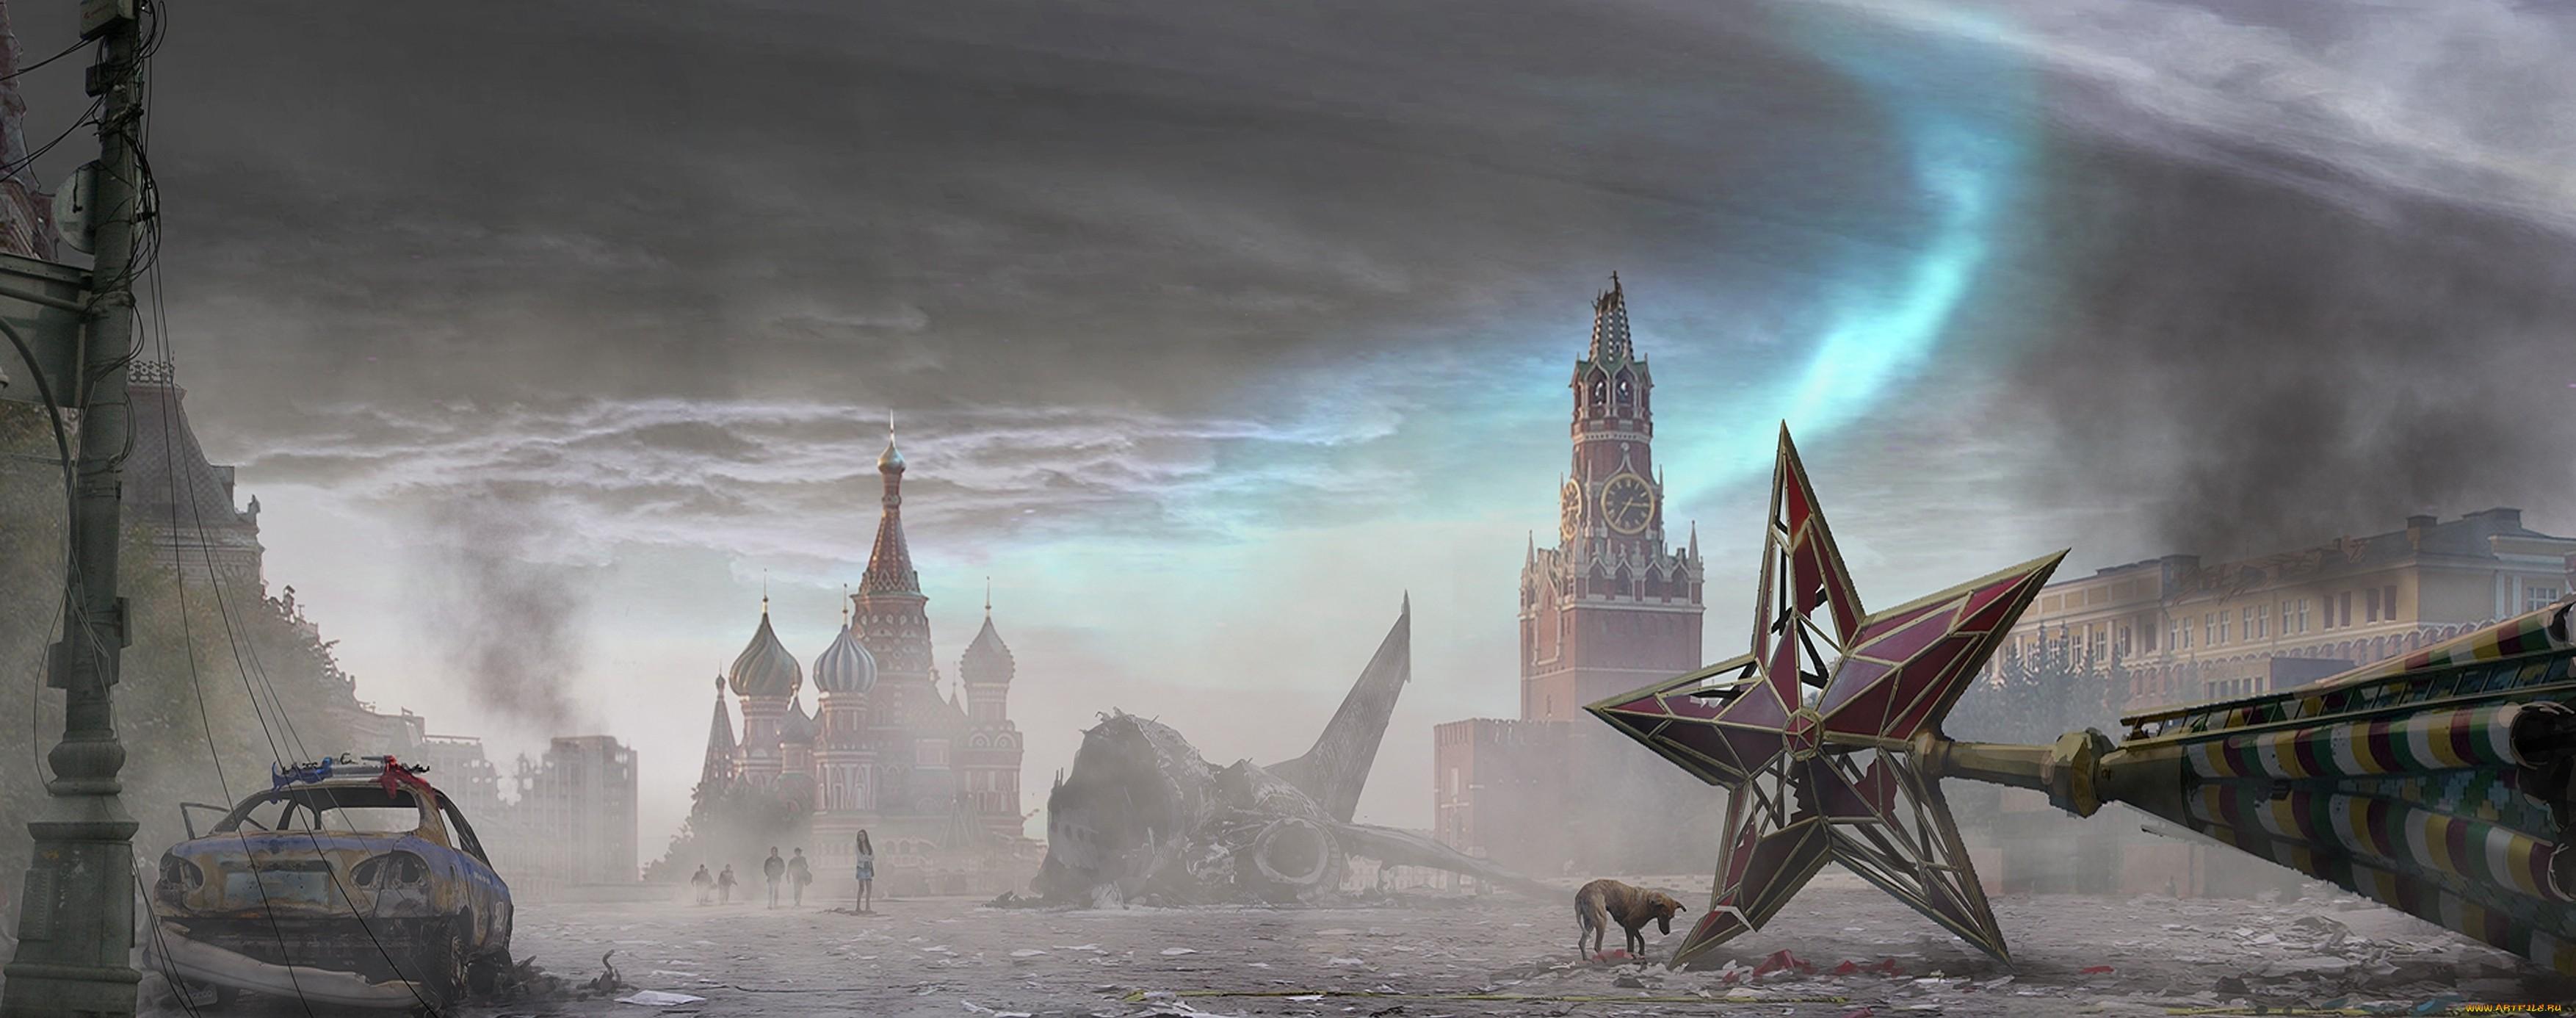 3508x1386_579509_[www.ArtFile.ru]